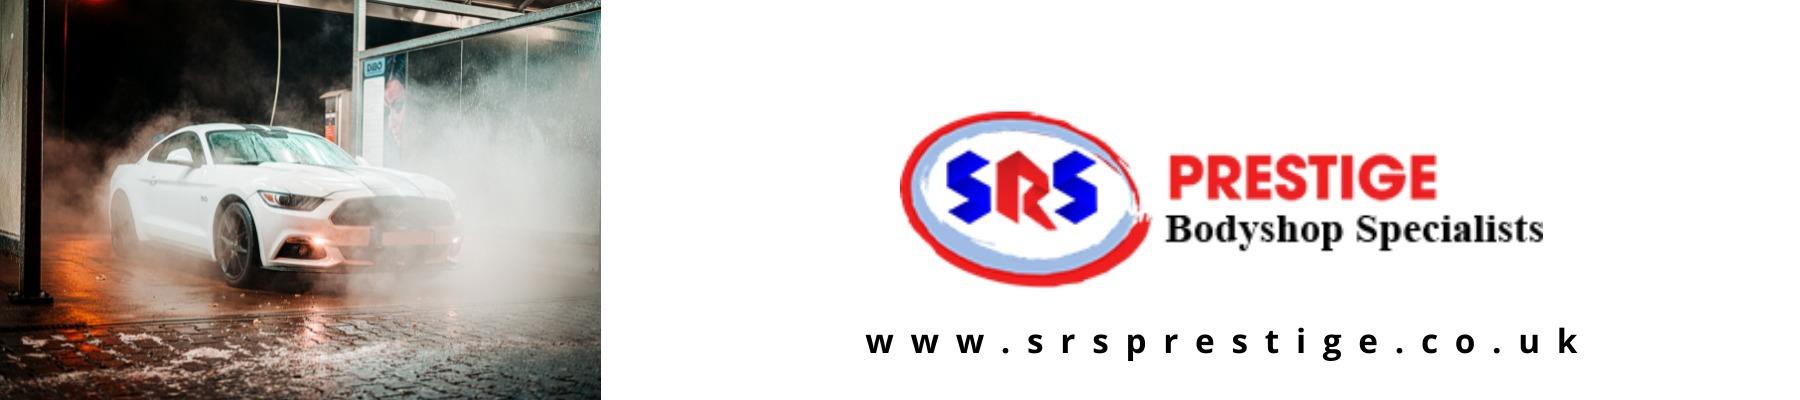 SRS Prestige (@srsprestige) Cover Image